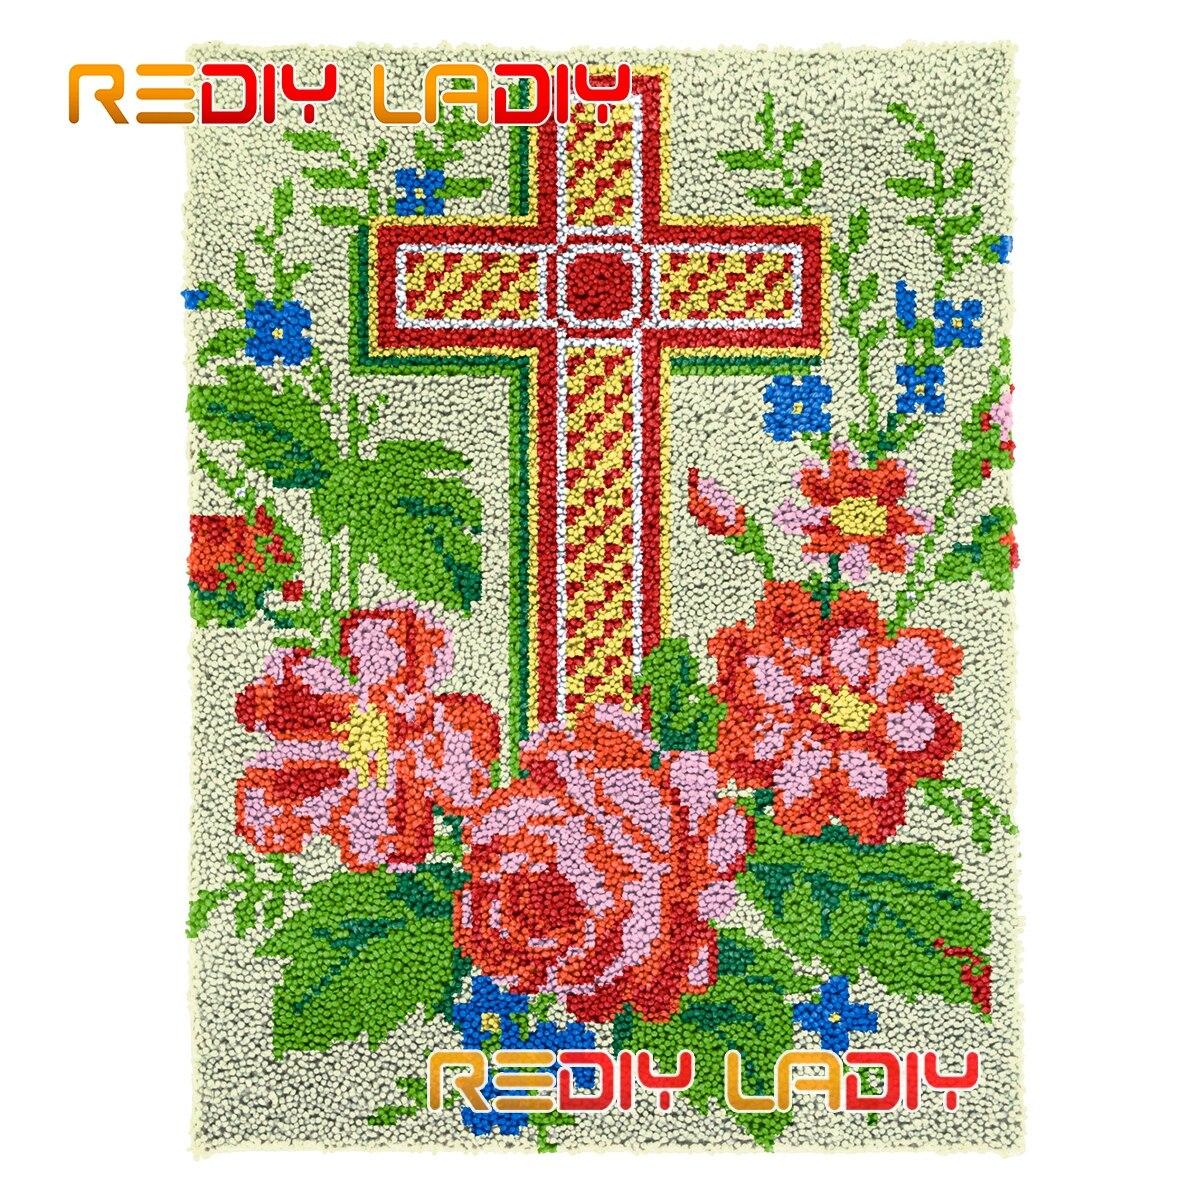 Latch Hook Rug Kits Forever Memory DIY Carpet Rug Plush Wall Hanging Chunky Yarn Arts Cushion Crocheted Floor Mat Hobby & Crafts